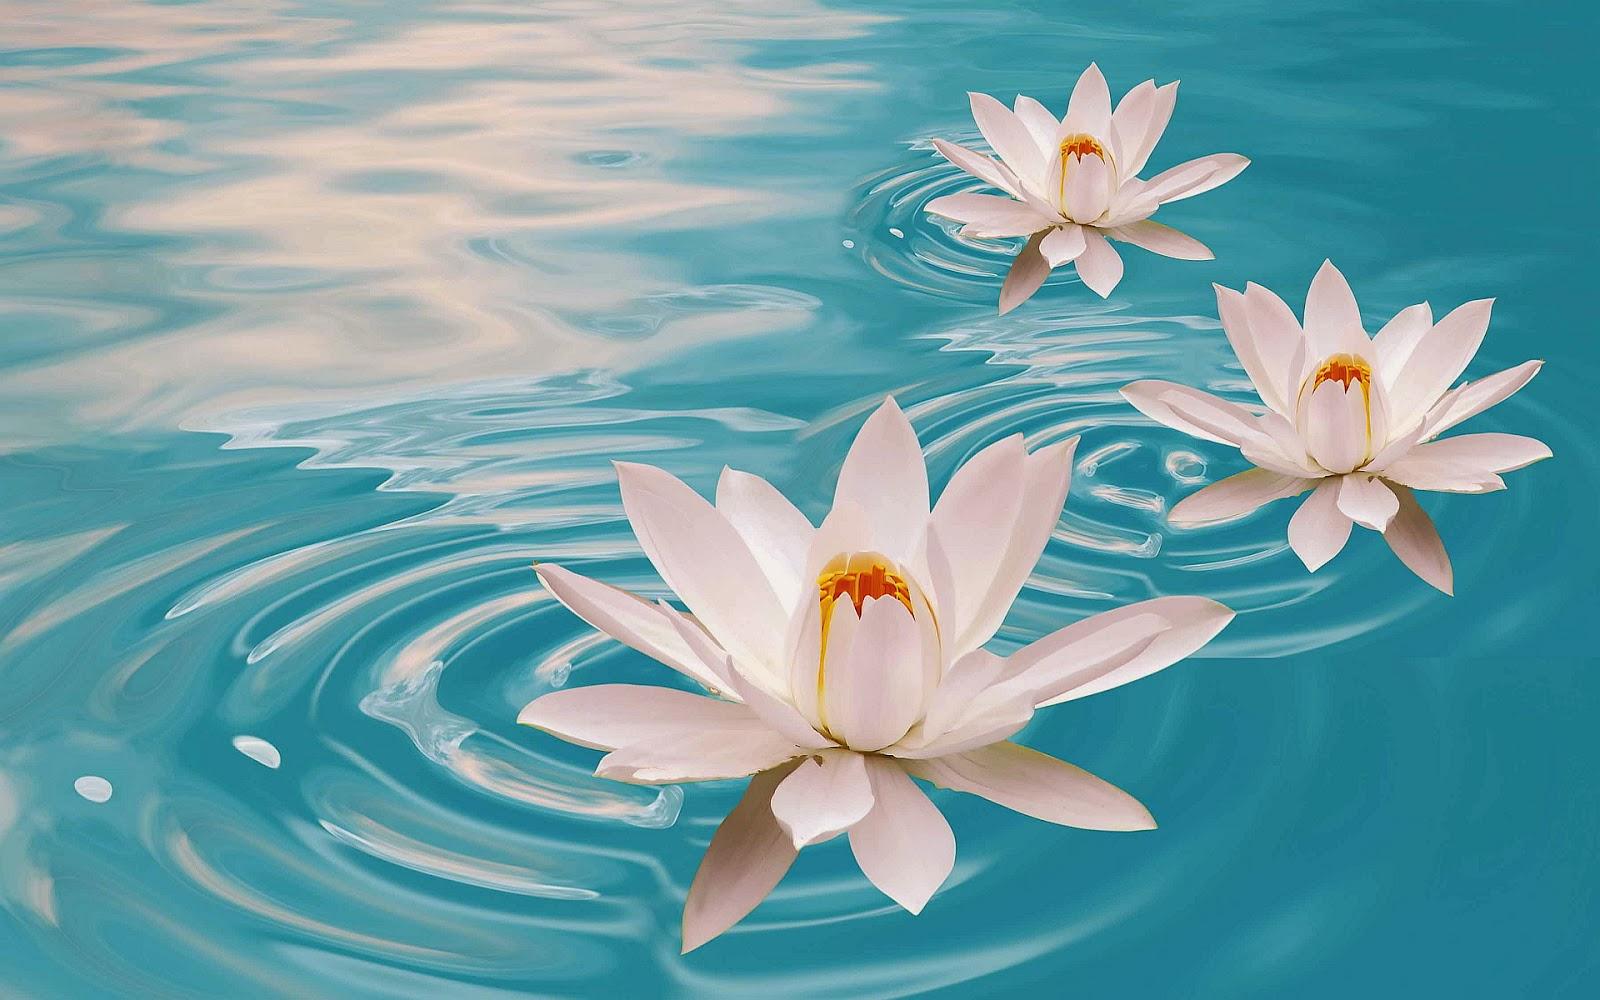 Lotus Flowers Wallpapers Beautiful Desktop Wallpapers 2014